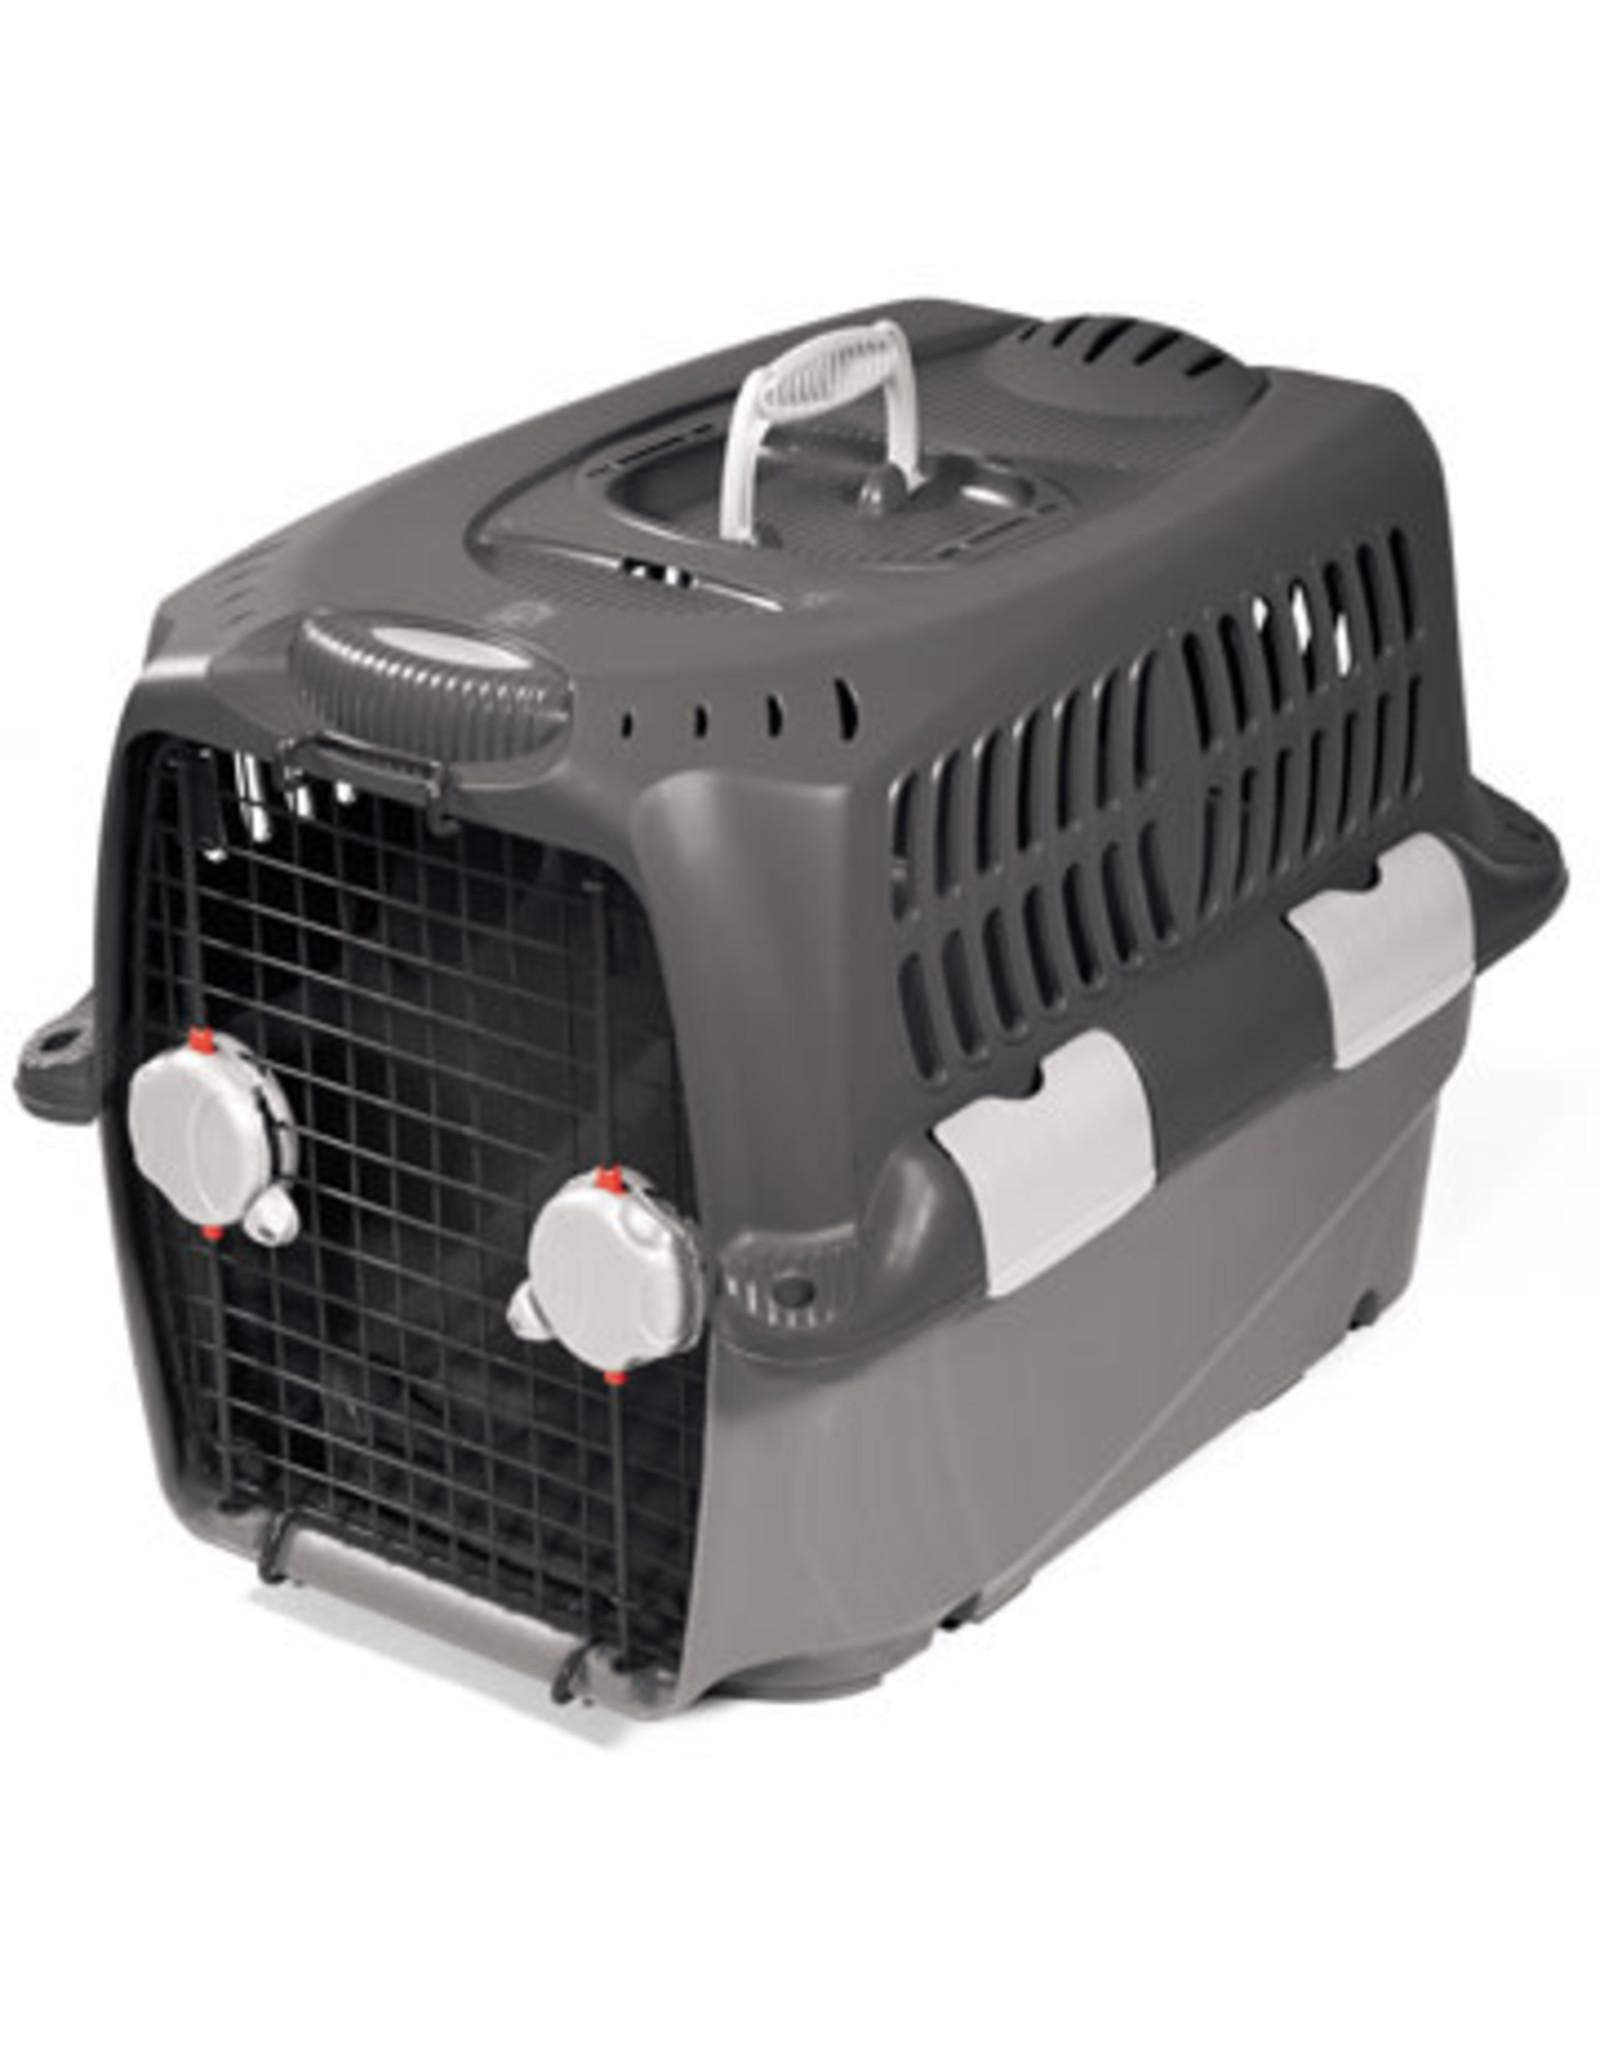 "DogIt Cargo Dog Carrier Gray Small 68cm L x 49cm W x 48cm H ( 27""x19.5""x19"")"